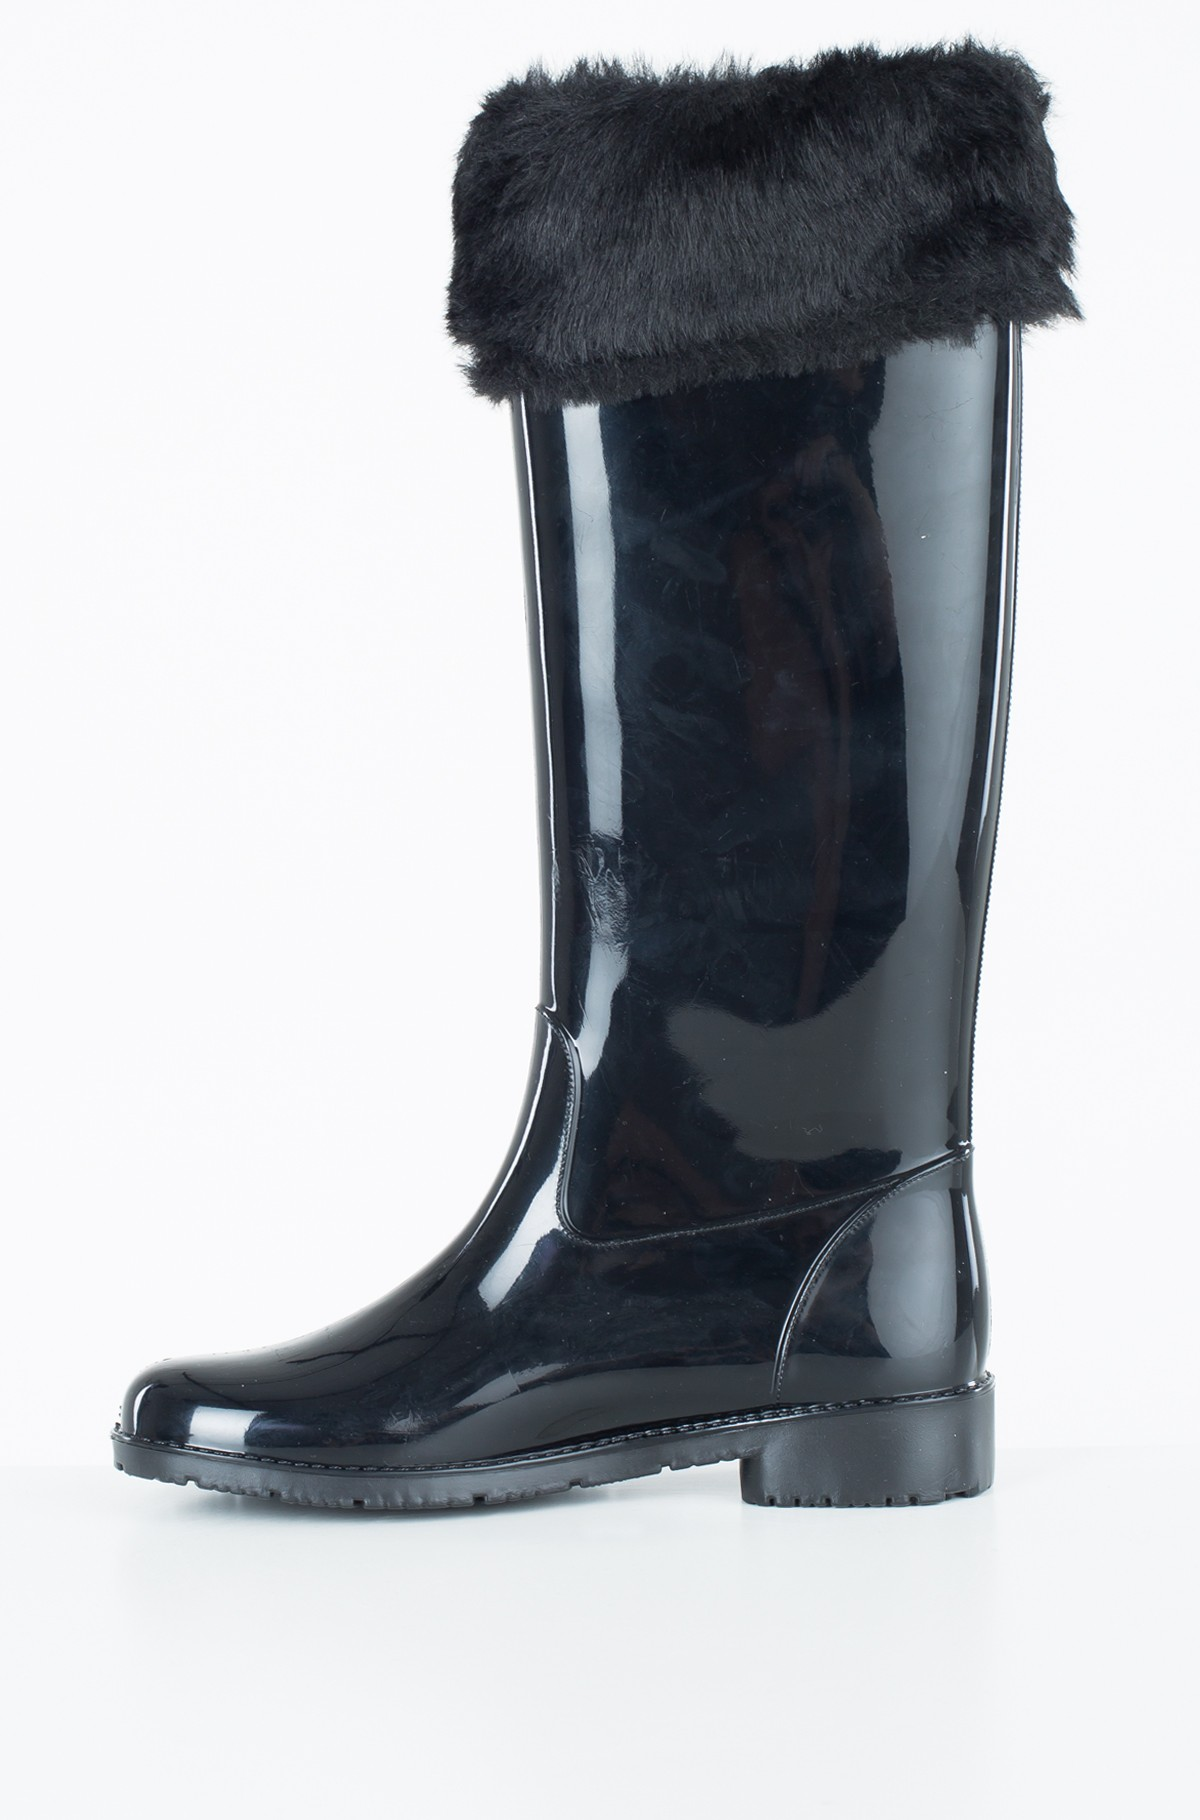 Guminiai batai FLRBE3 RUB11-full-2